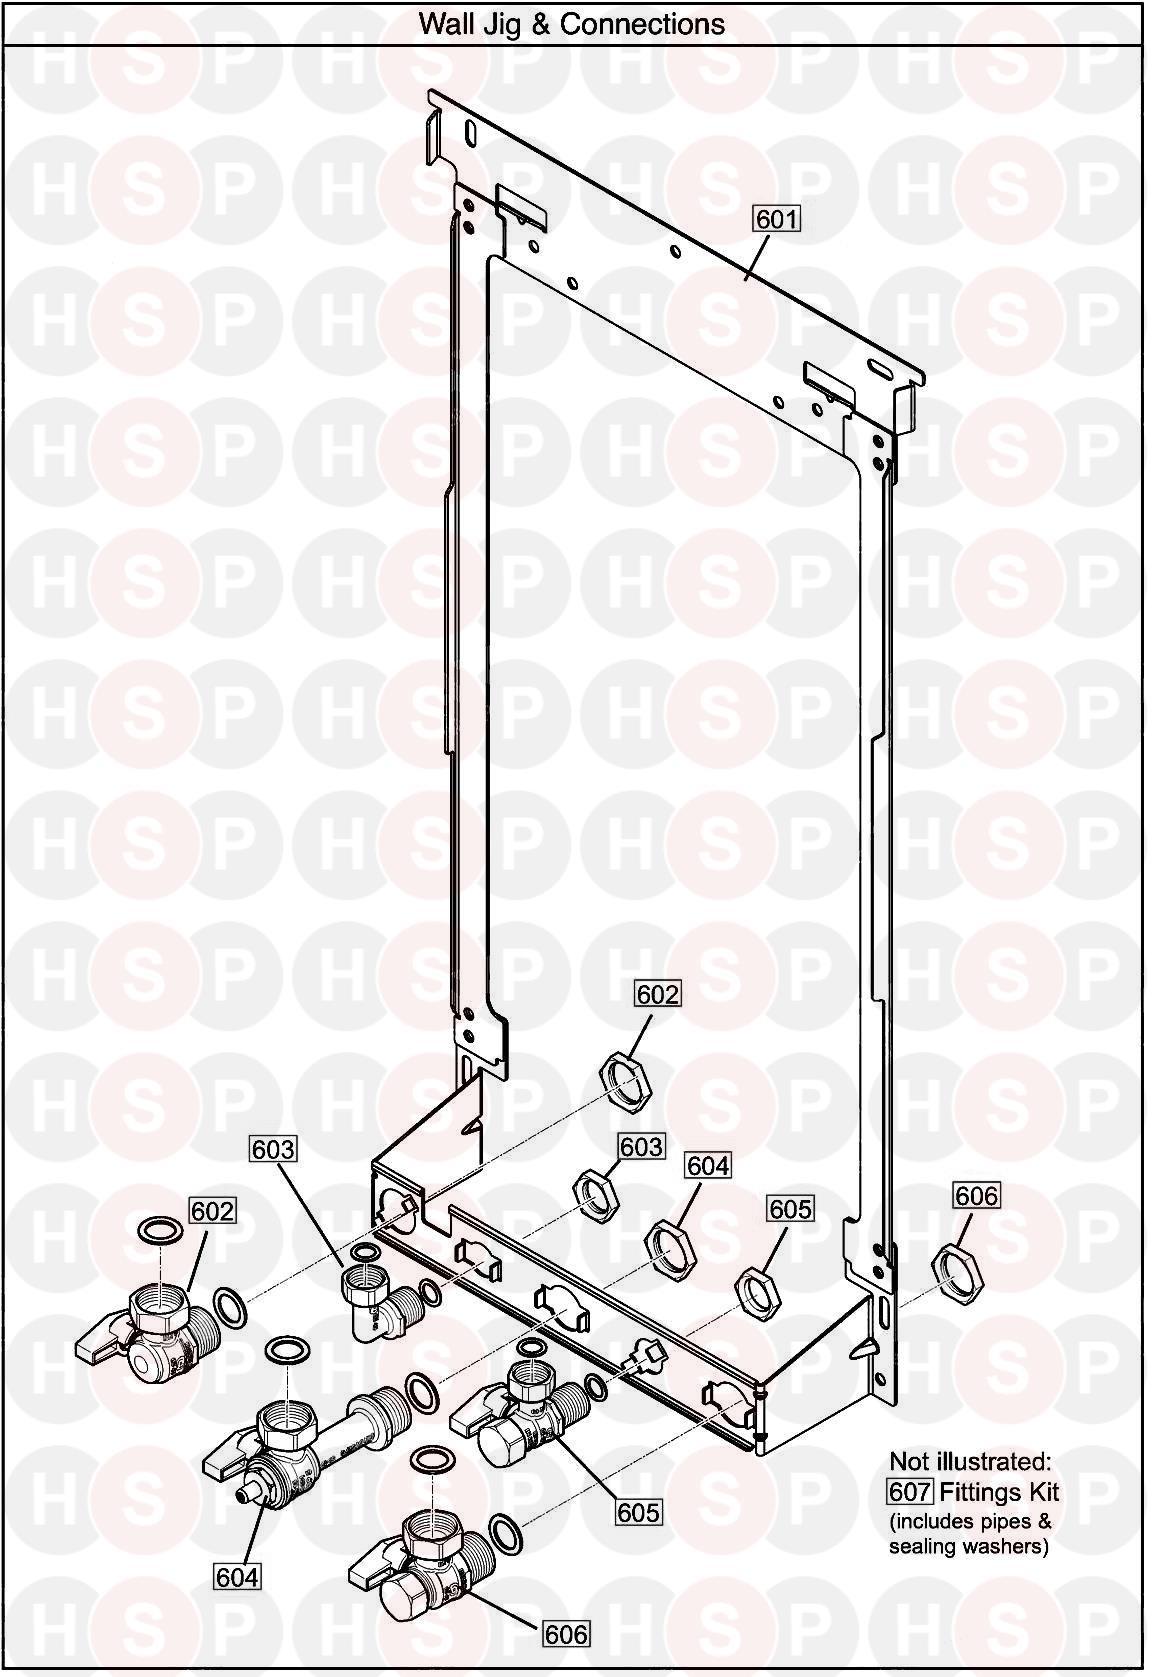 grant oil boiler wiring diagram weil mclain boiler wiring